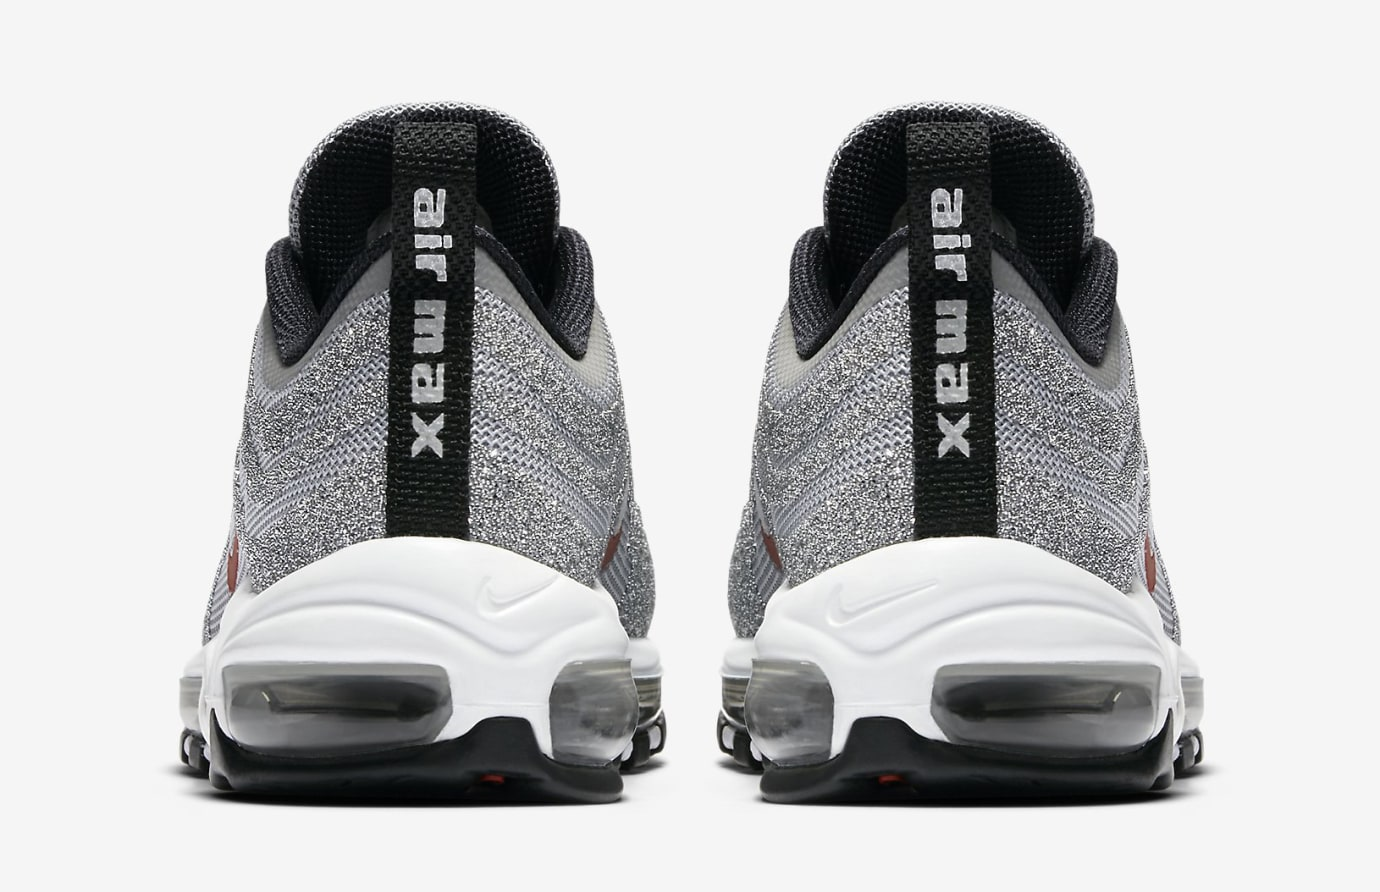 Nike Air Max 97 Swarovski Crystal Silver Bullet 927508 002